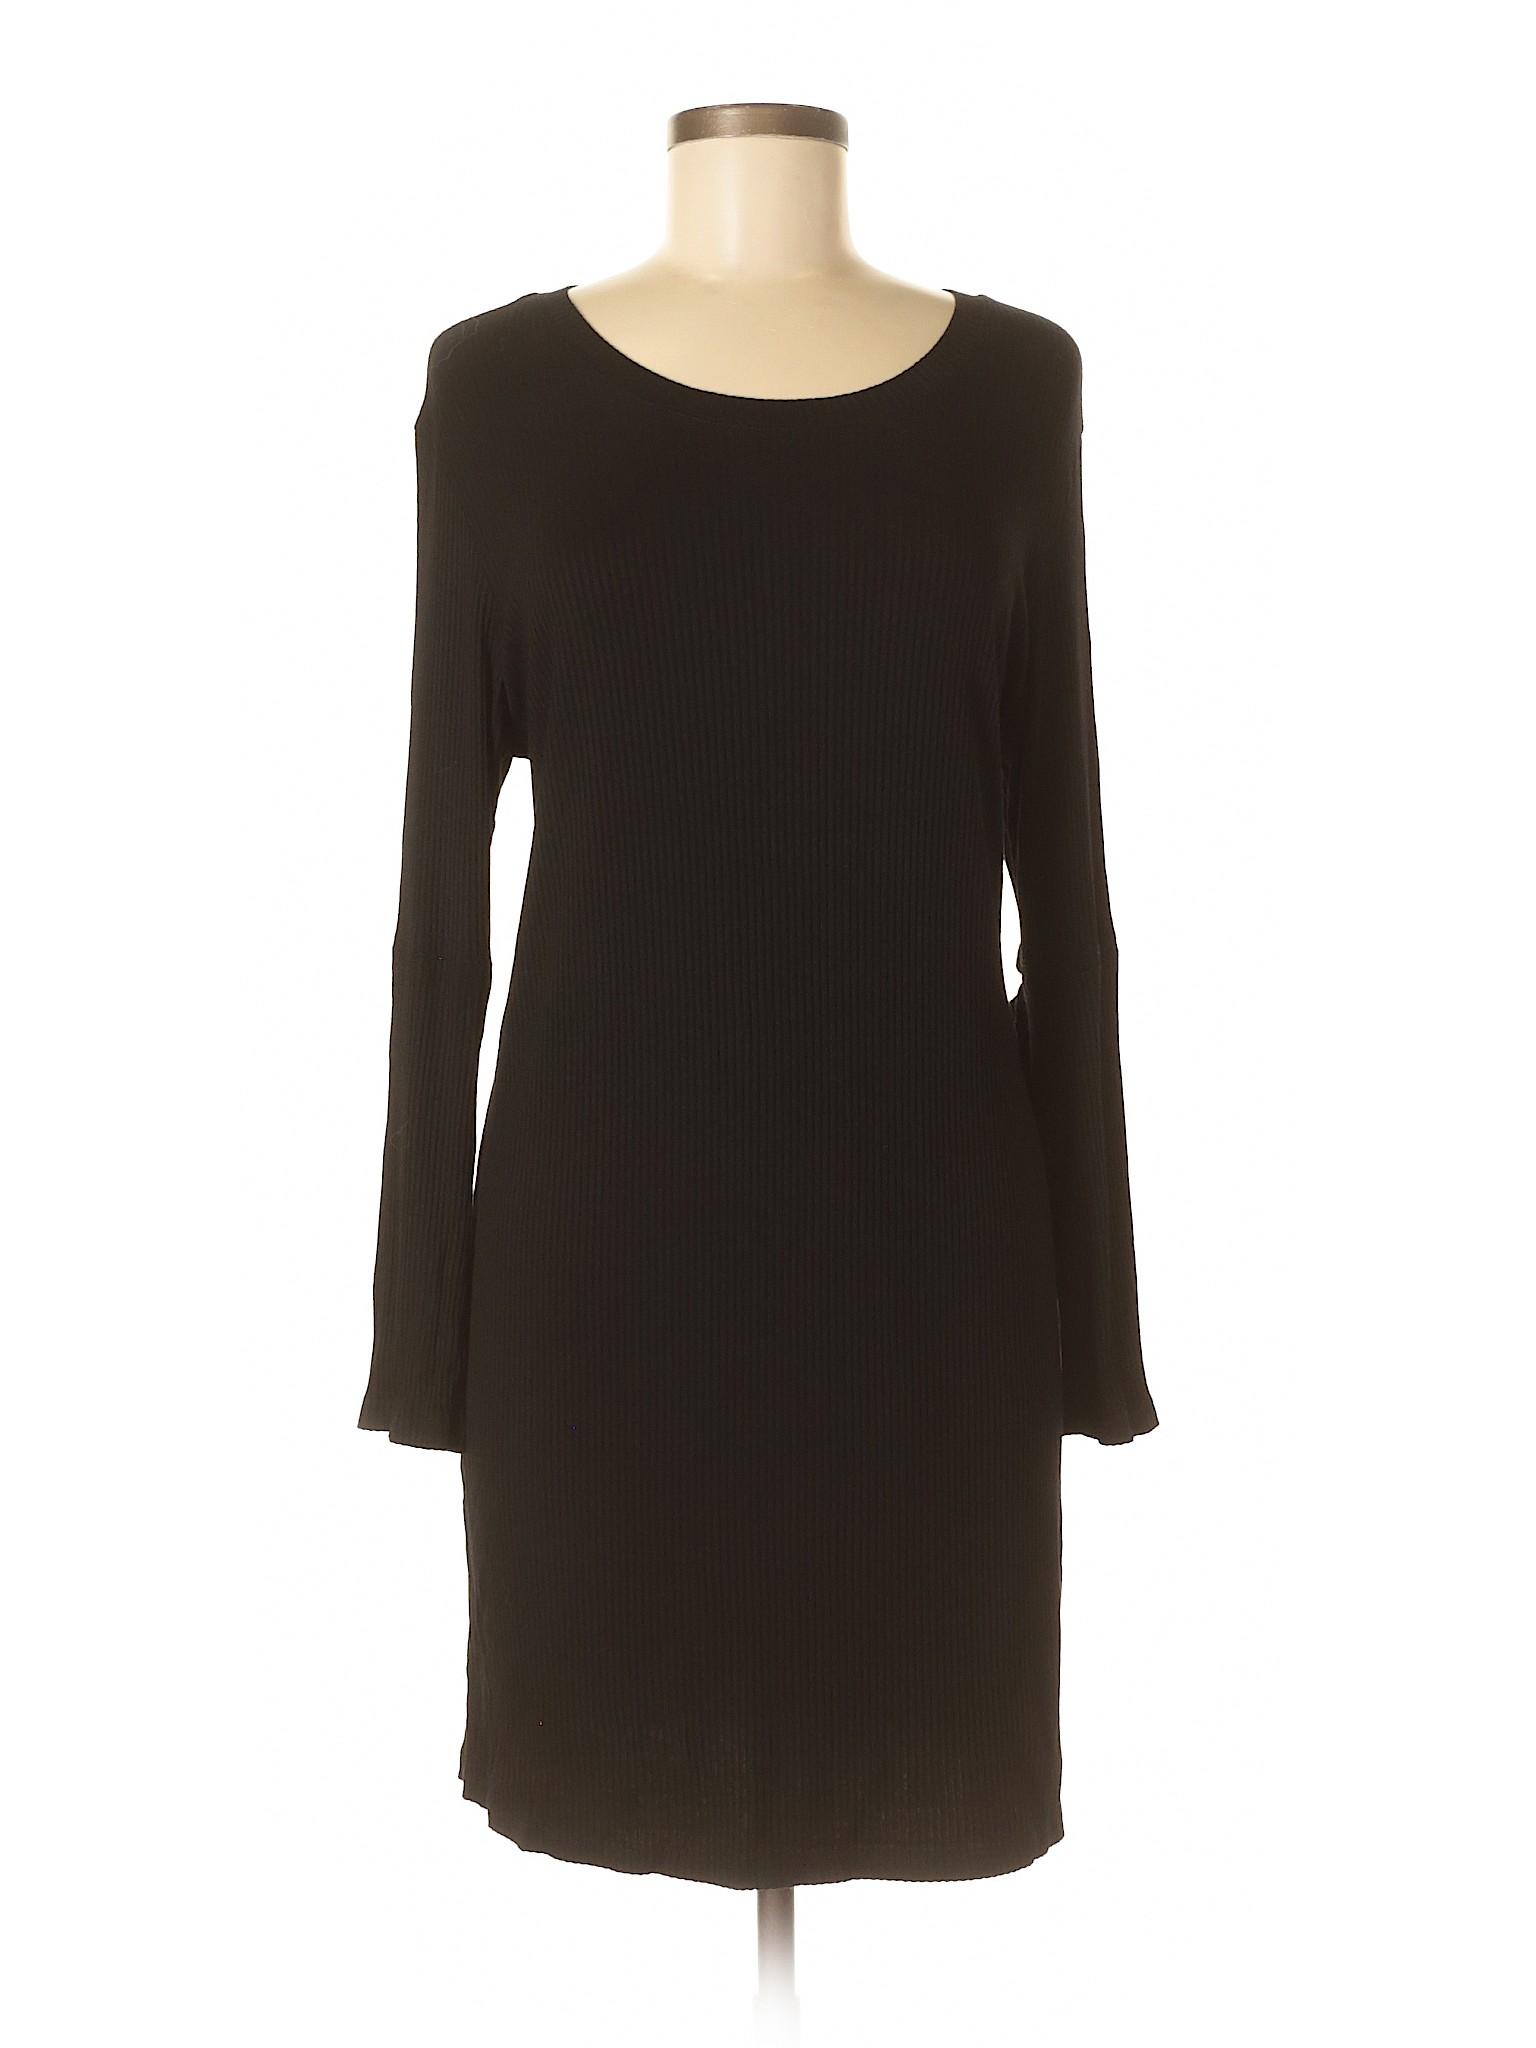 Dress Monrow Casual Monrow Dress Selling Casual Selling Selling Dress Monrow Selling Casual qEHaXwPpUU